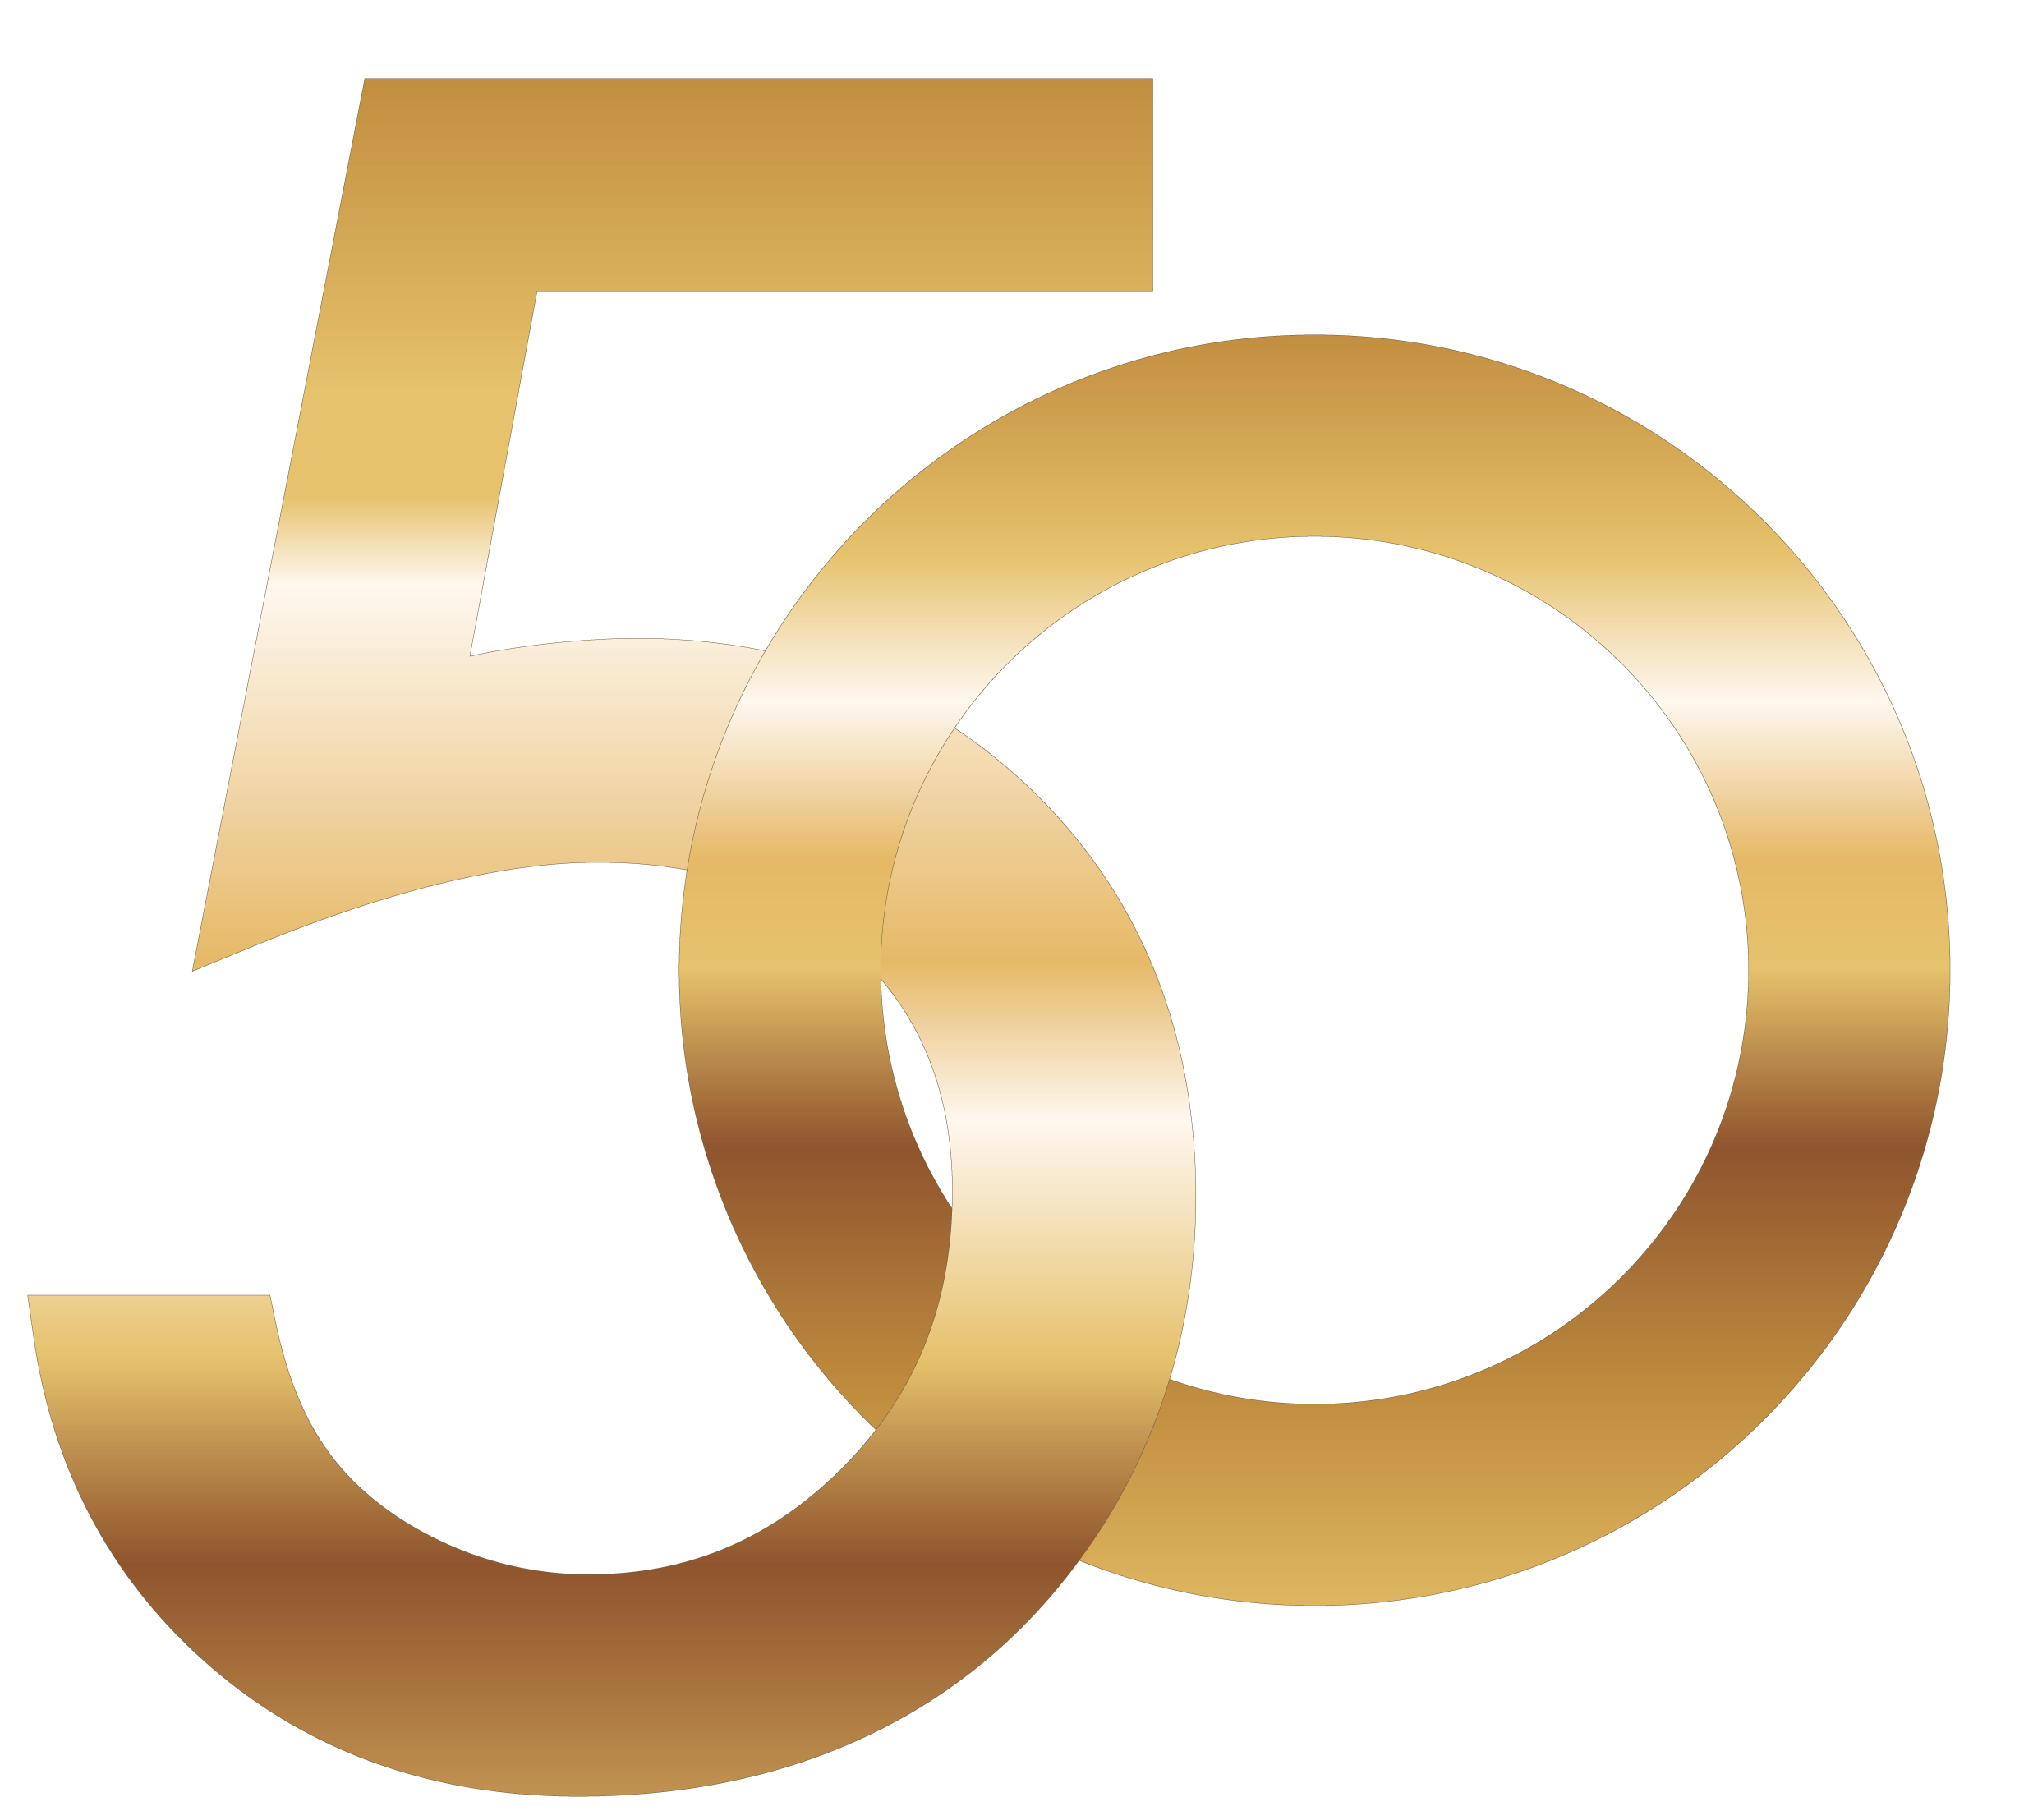 50 Number PNG Image.